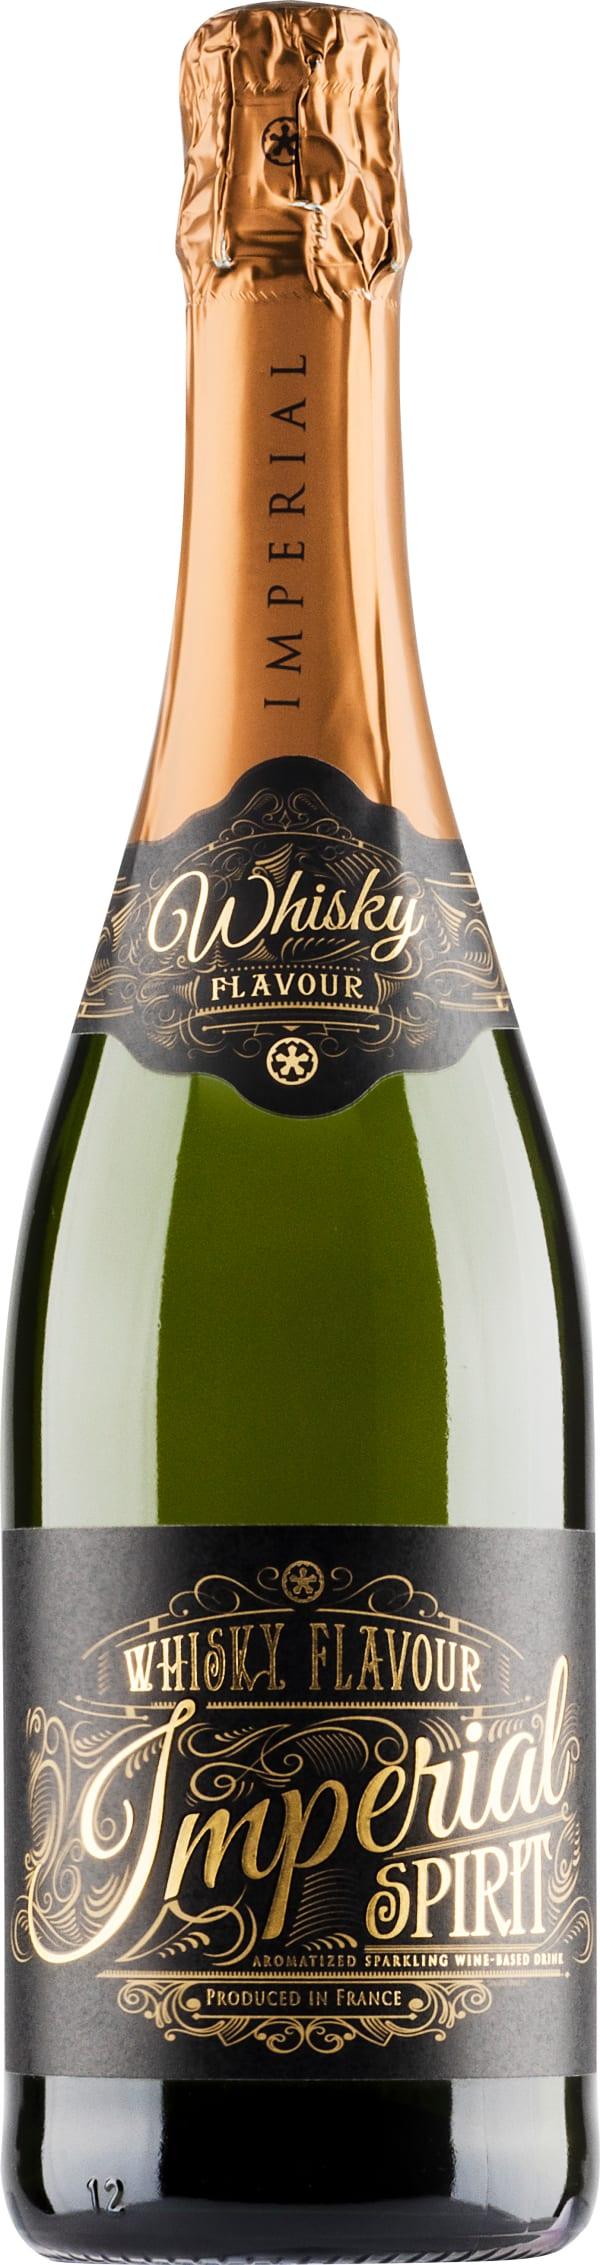 Imperial Spirit Whisky Flavour Sparkling Sec